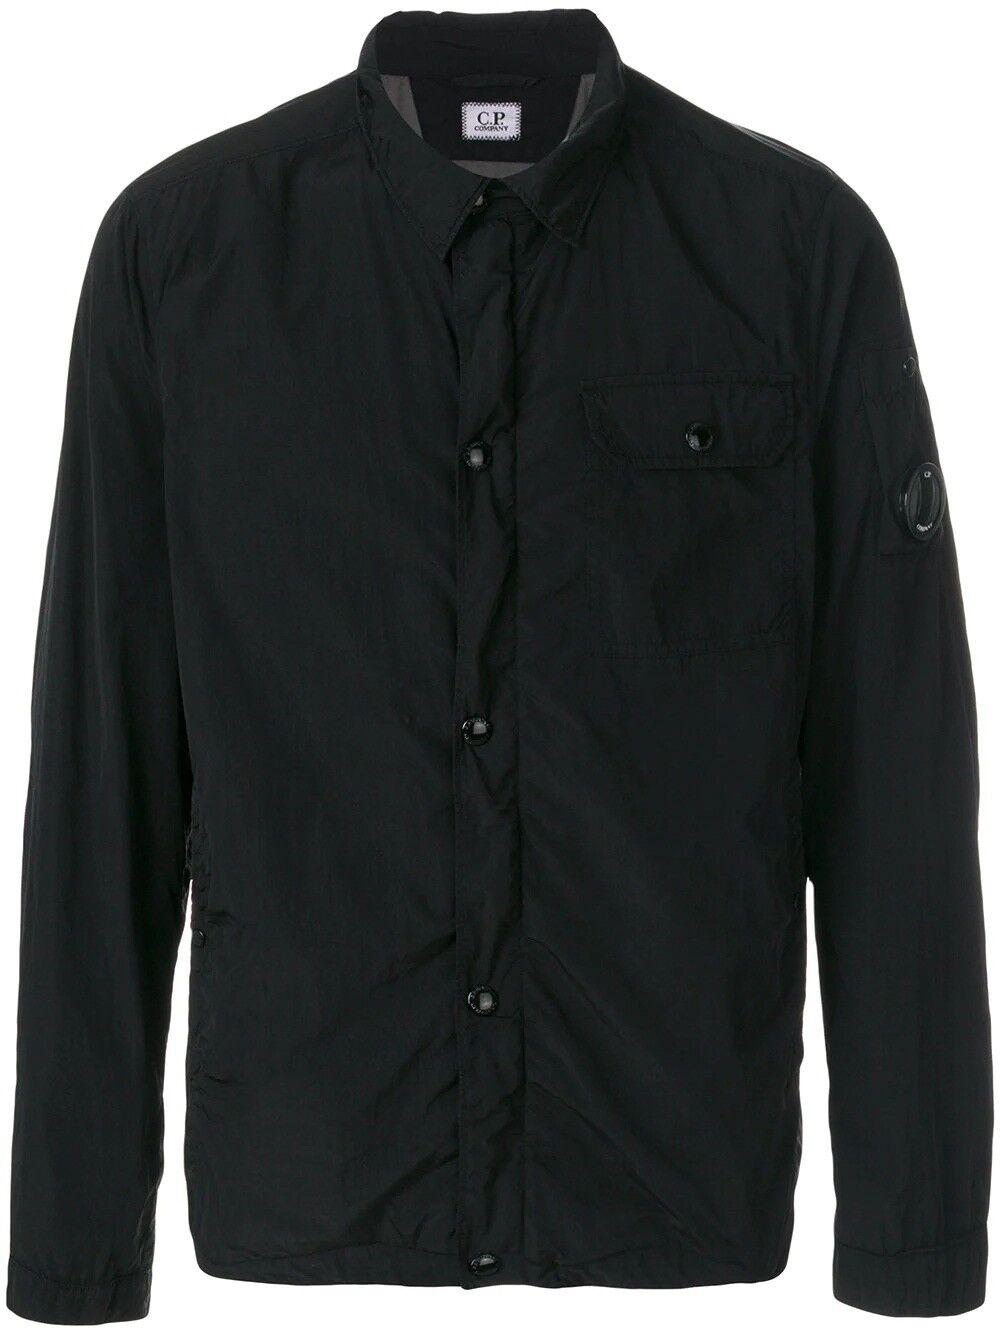 Genuine CP Company da uomo indumento tinto tinto tinto Overshirt Nero Taglia L b8aabd